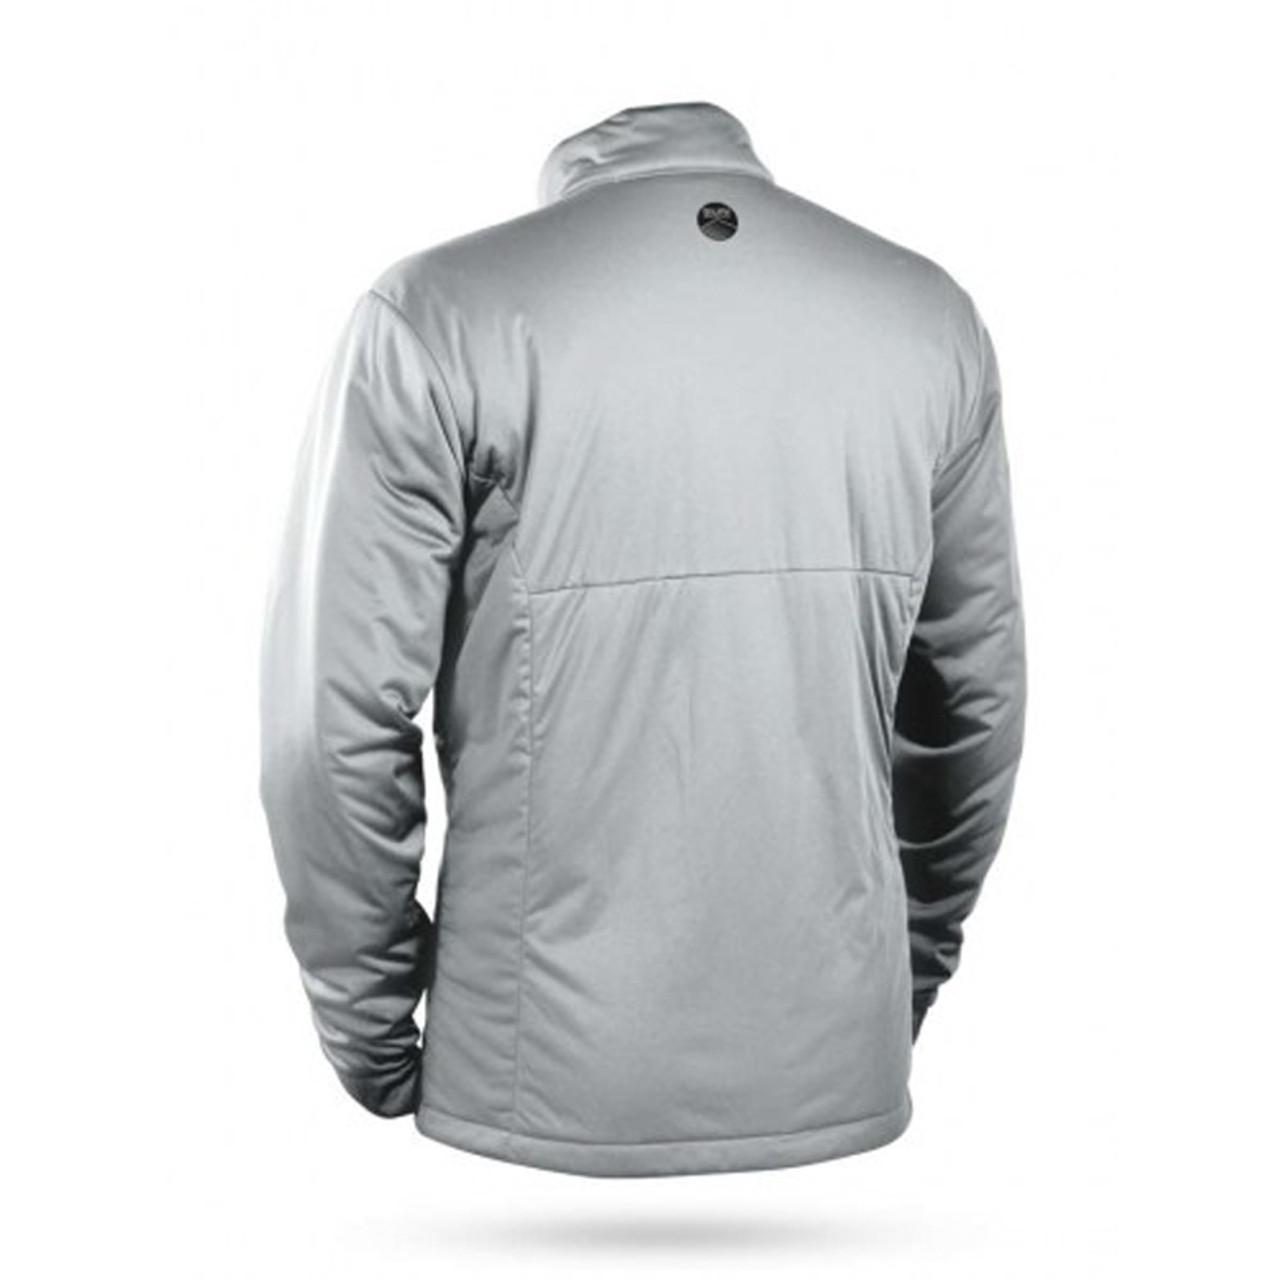 Sun Mountain Trapper Jacket - Platinum